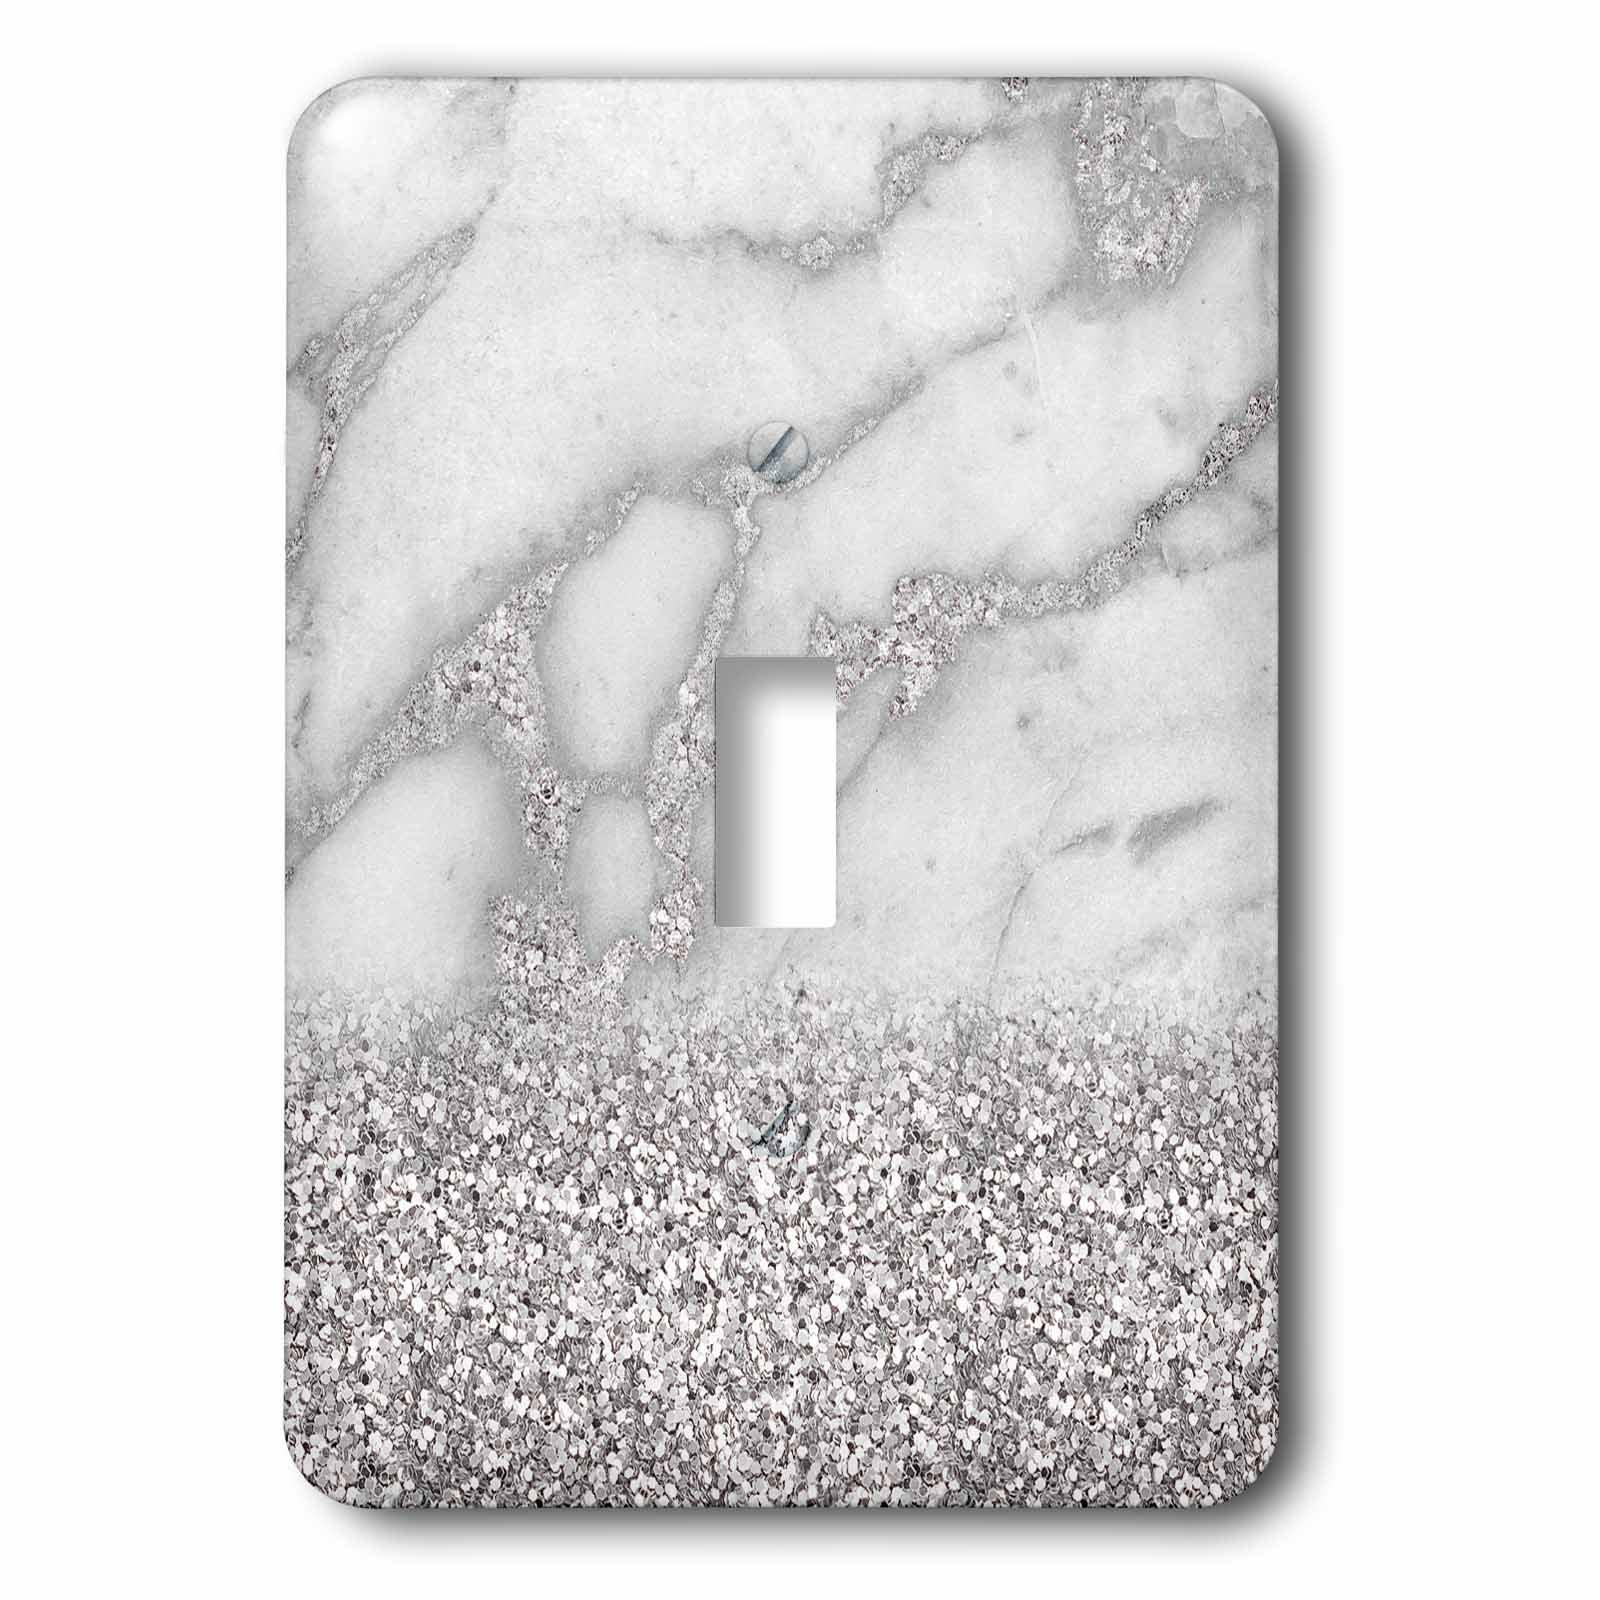 3dRose (lsp_268850_1) Single Toggle Switch (1) Luxury Grey Silver Gem Stone Marble Glitter Metallic Faux Print